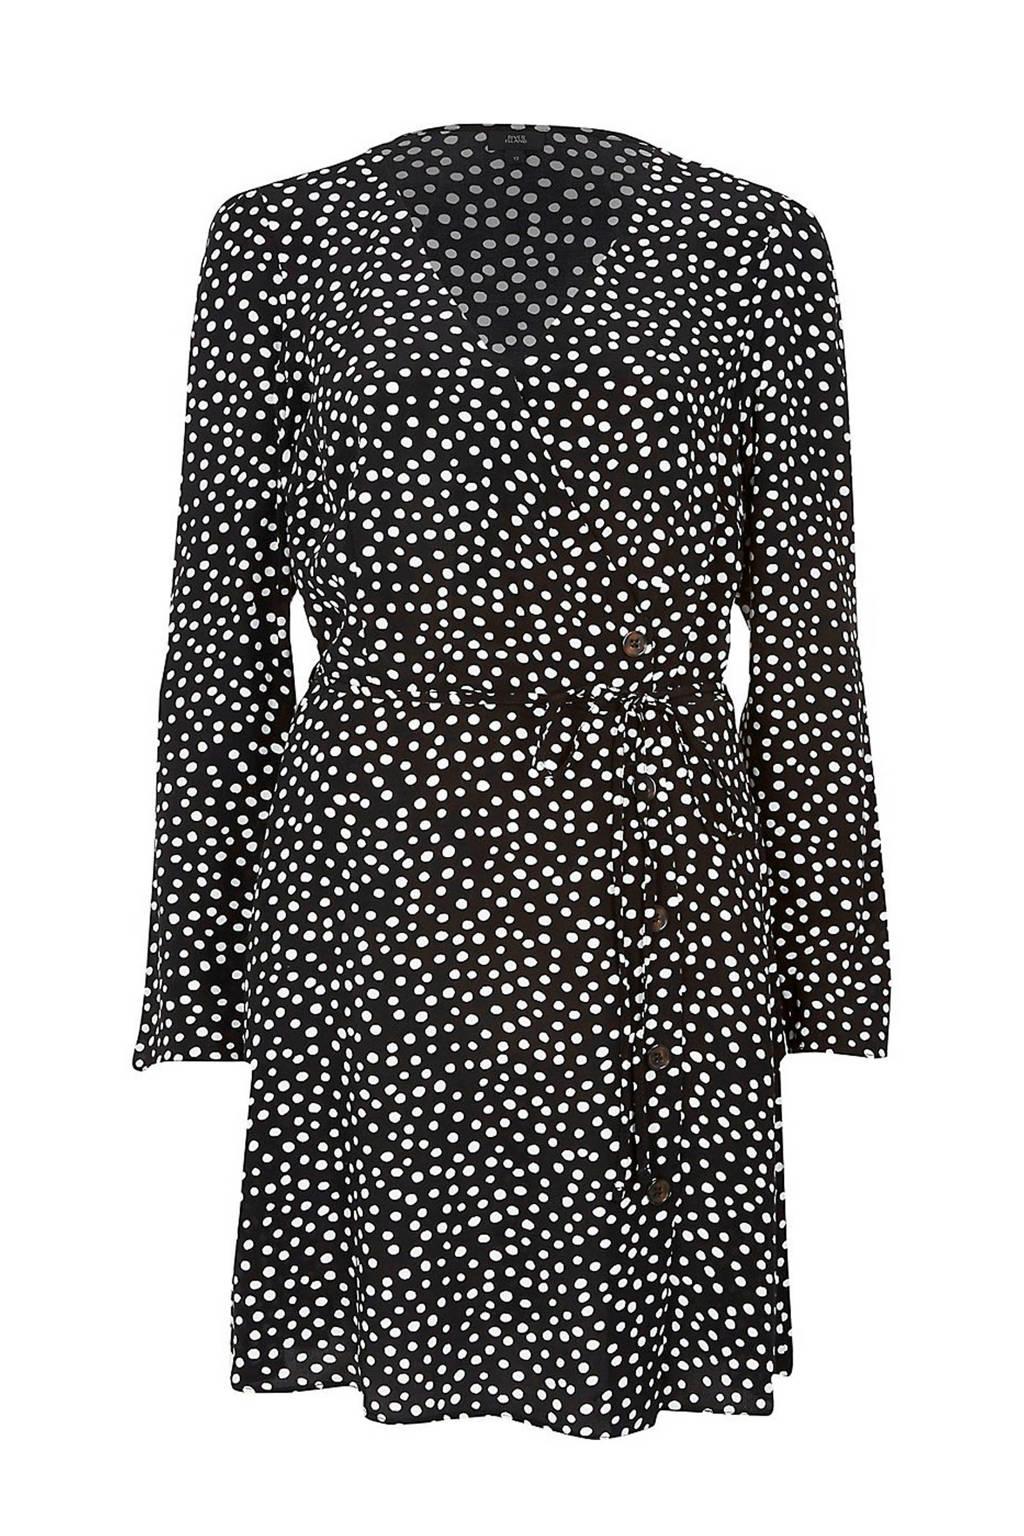 River Island jurk met stippen, Zwart/wit